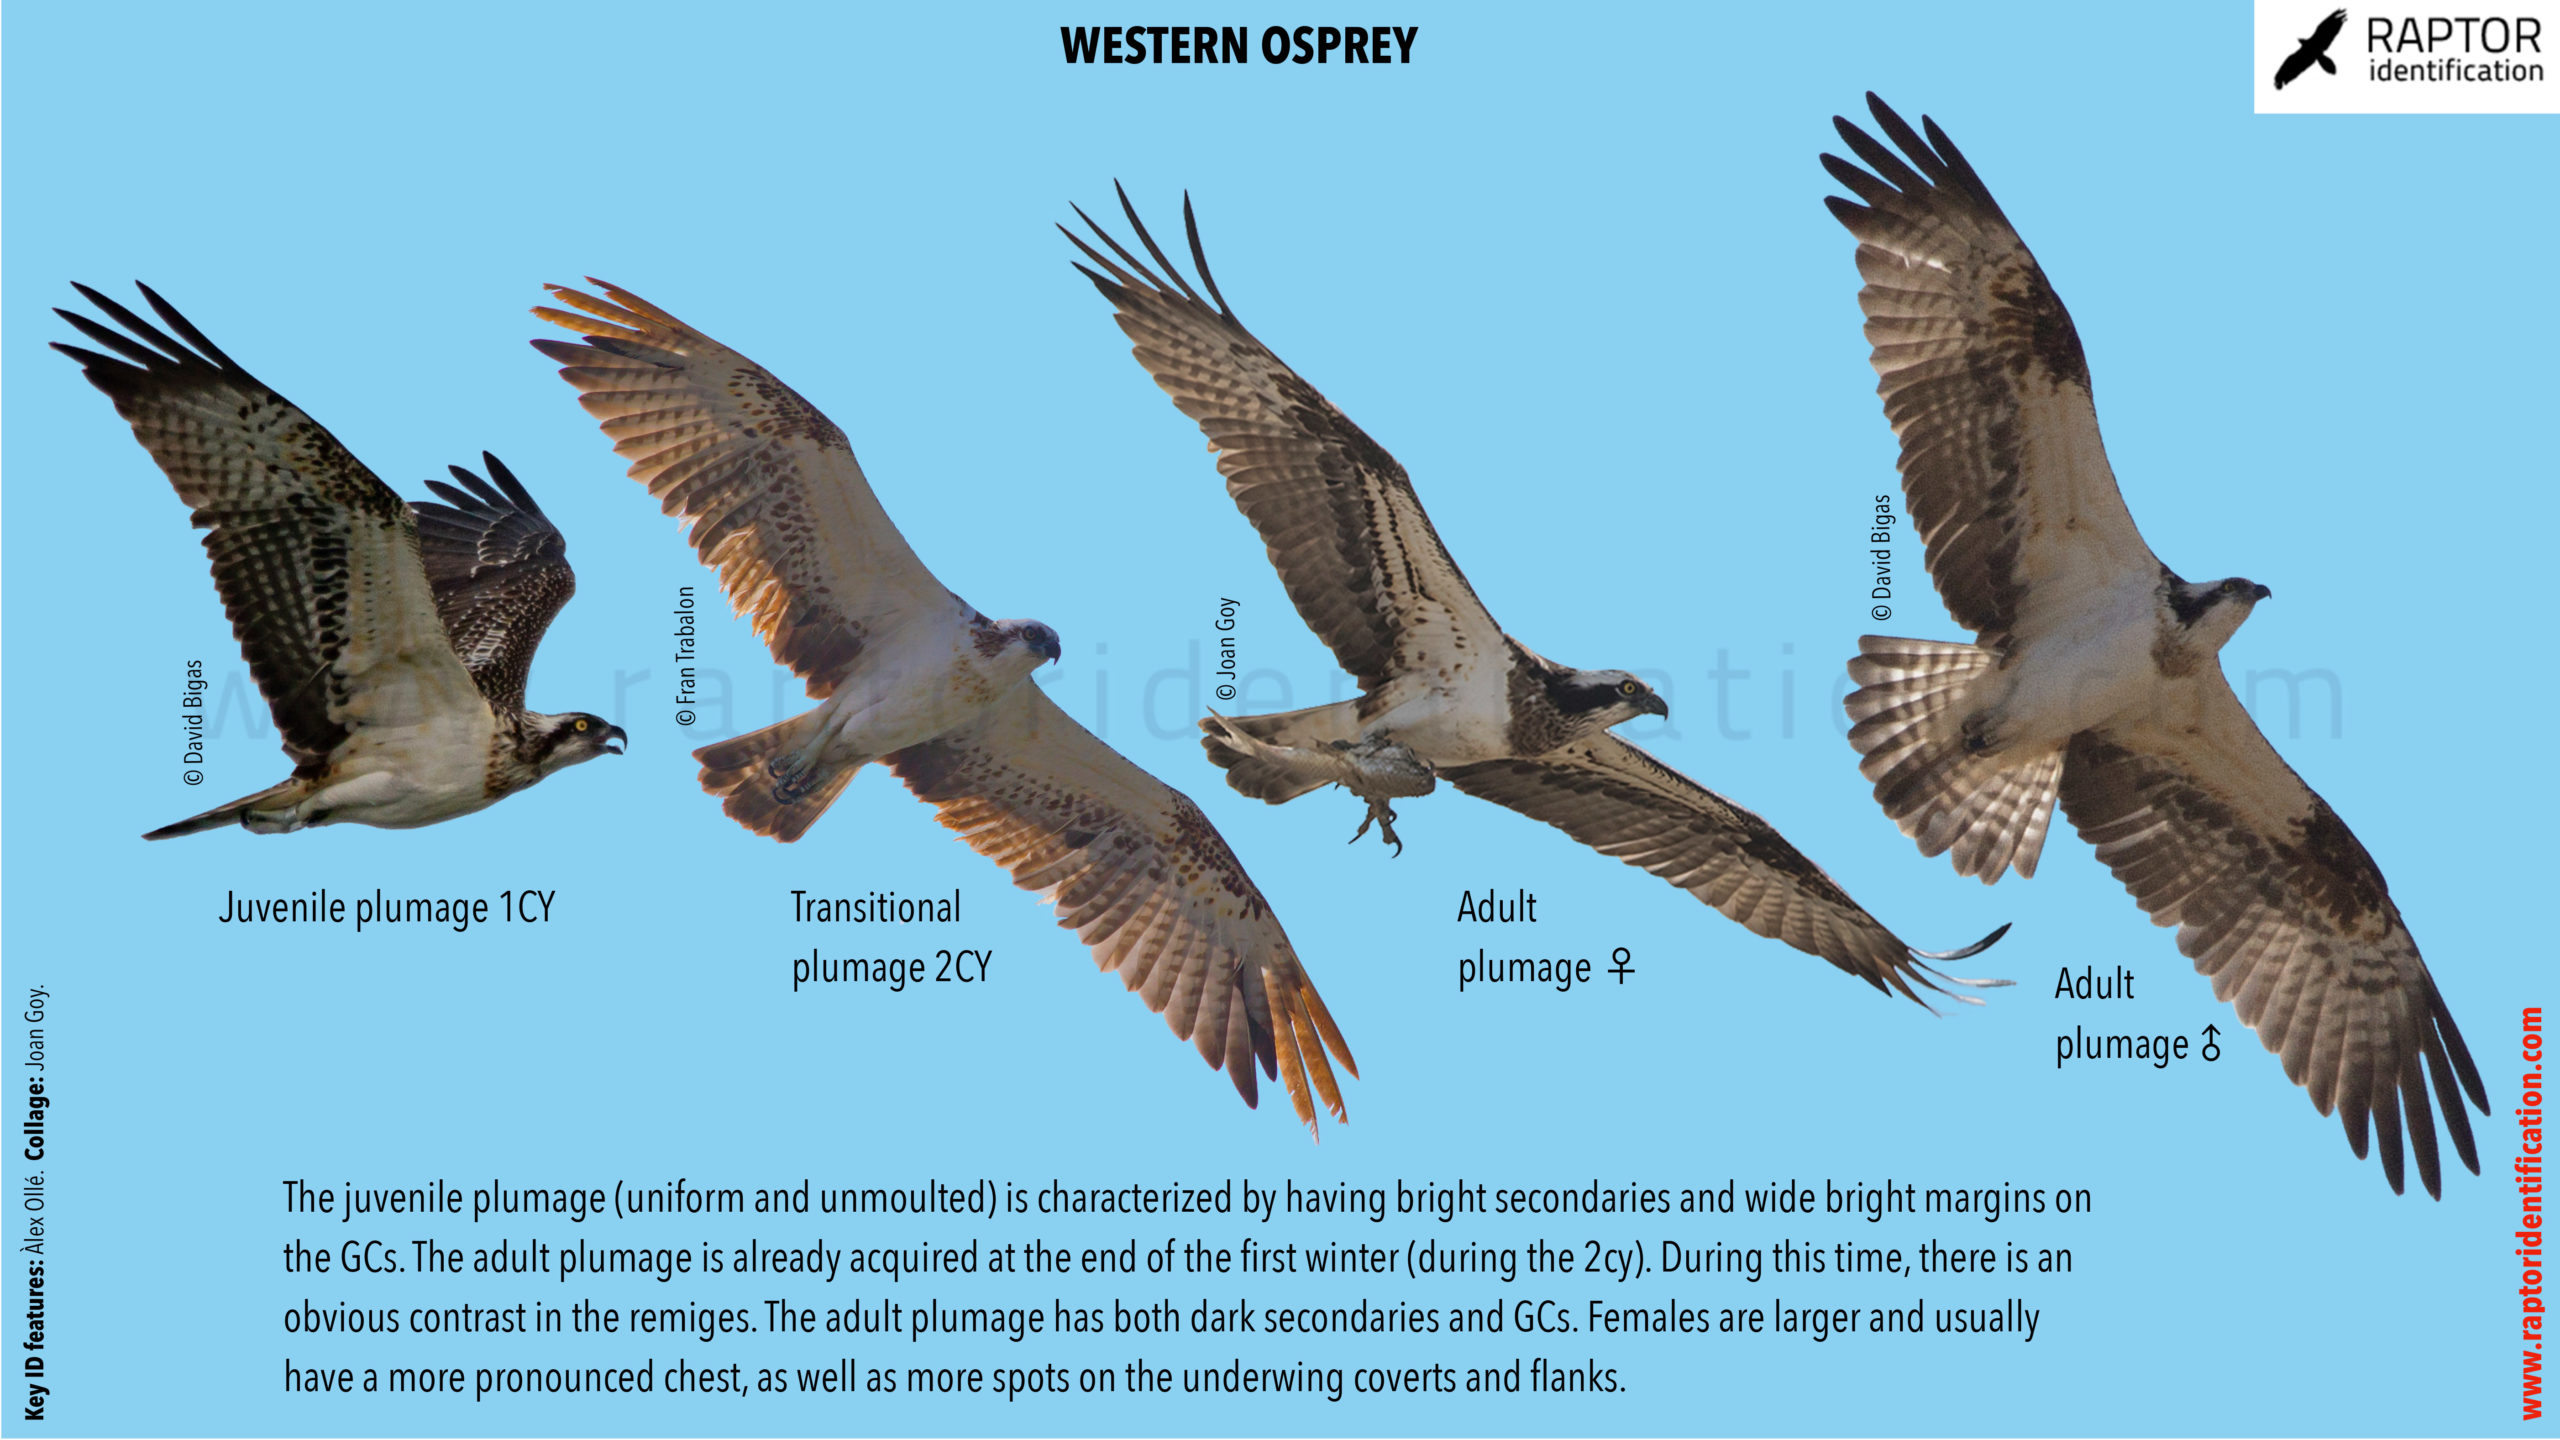 Western-Osprey-identification-collage